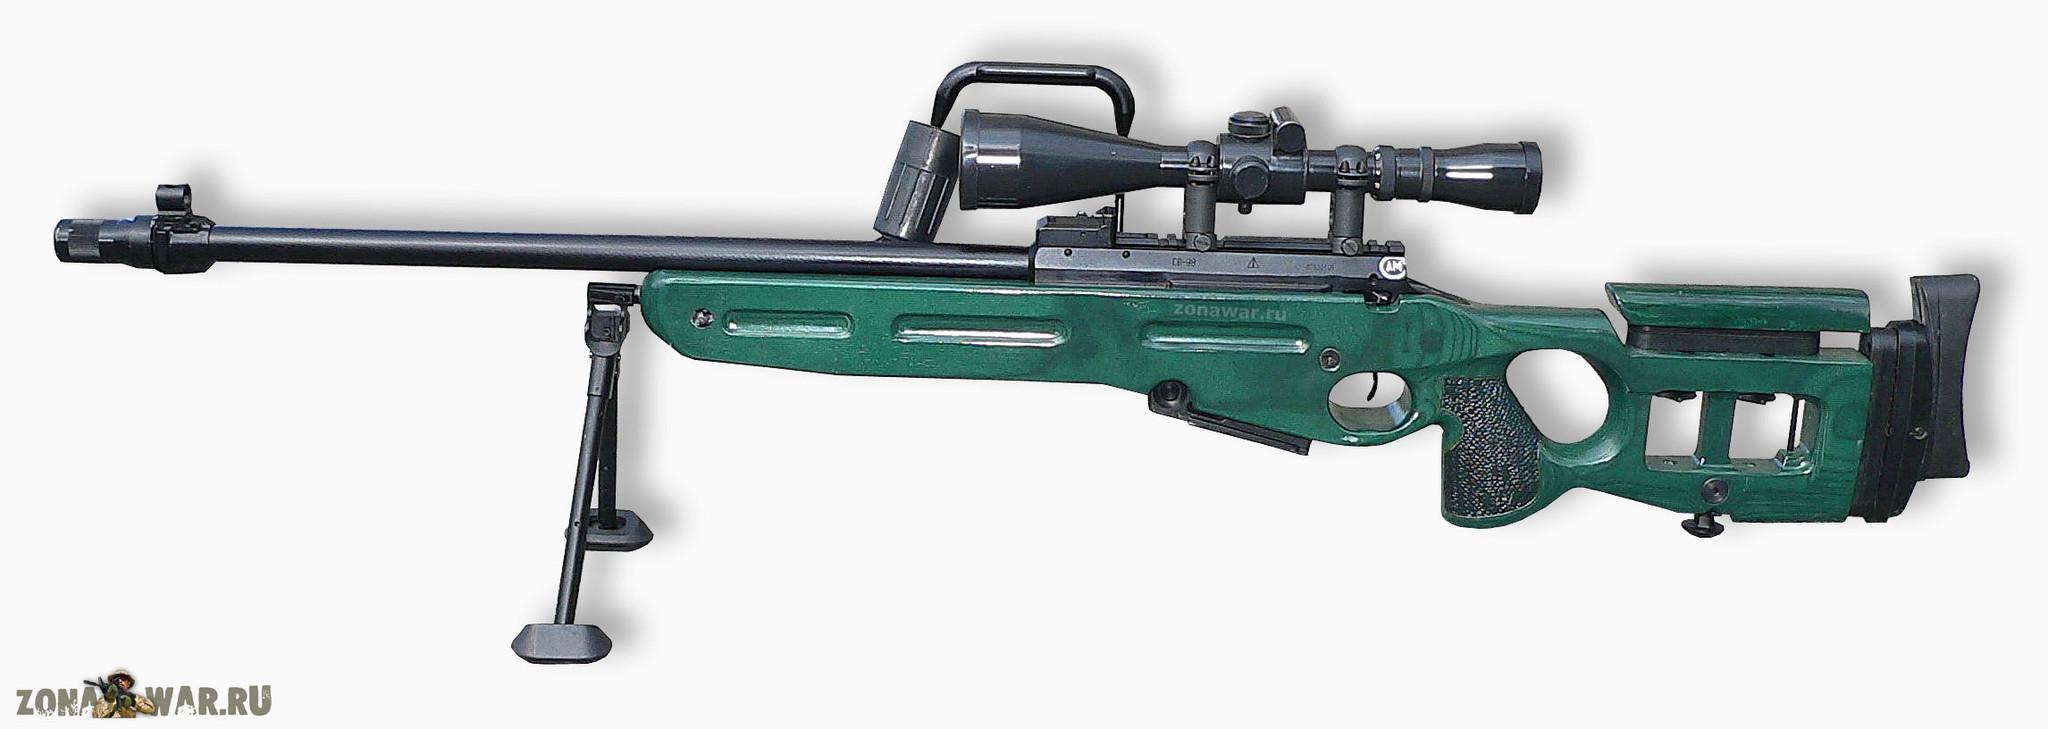 Sv 98 Sniper Rifle